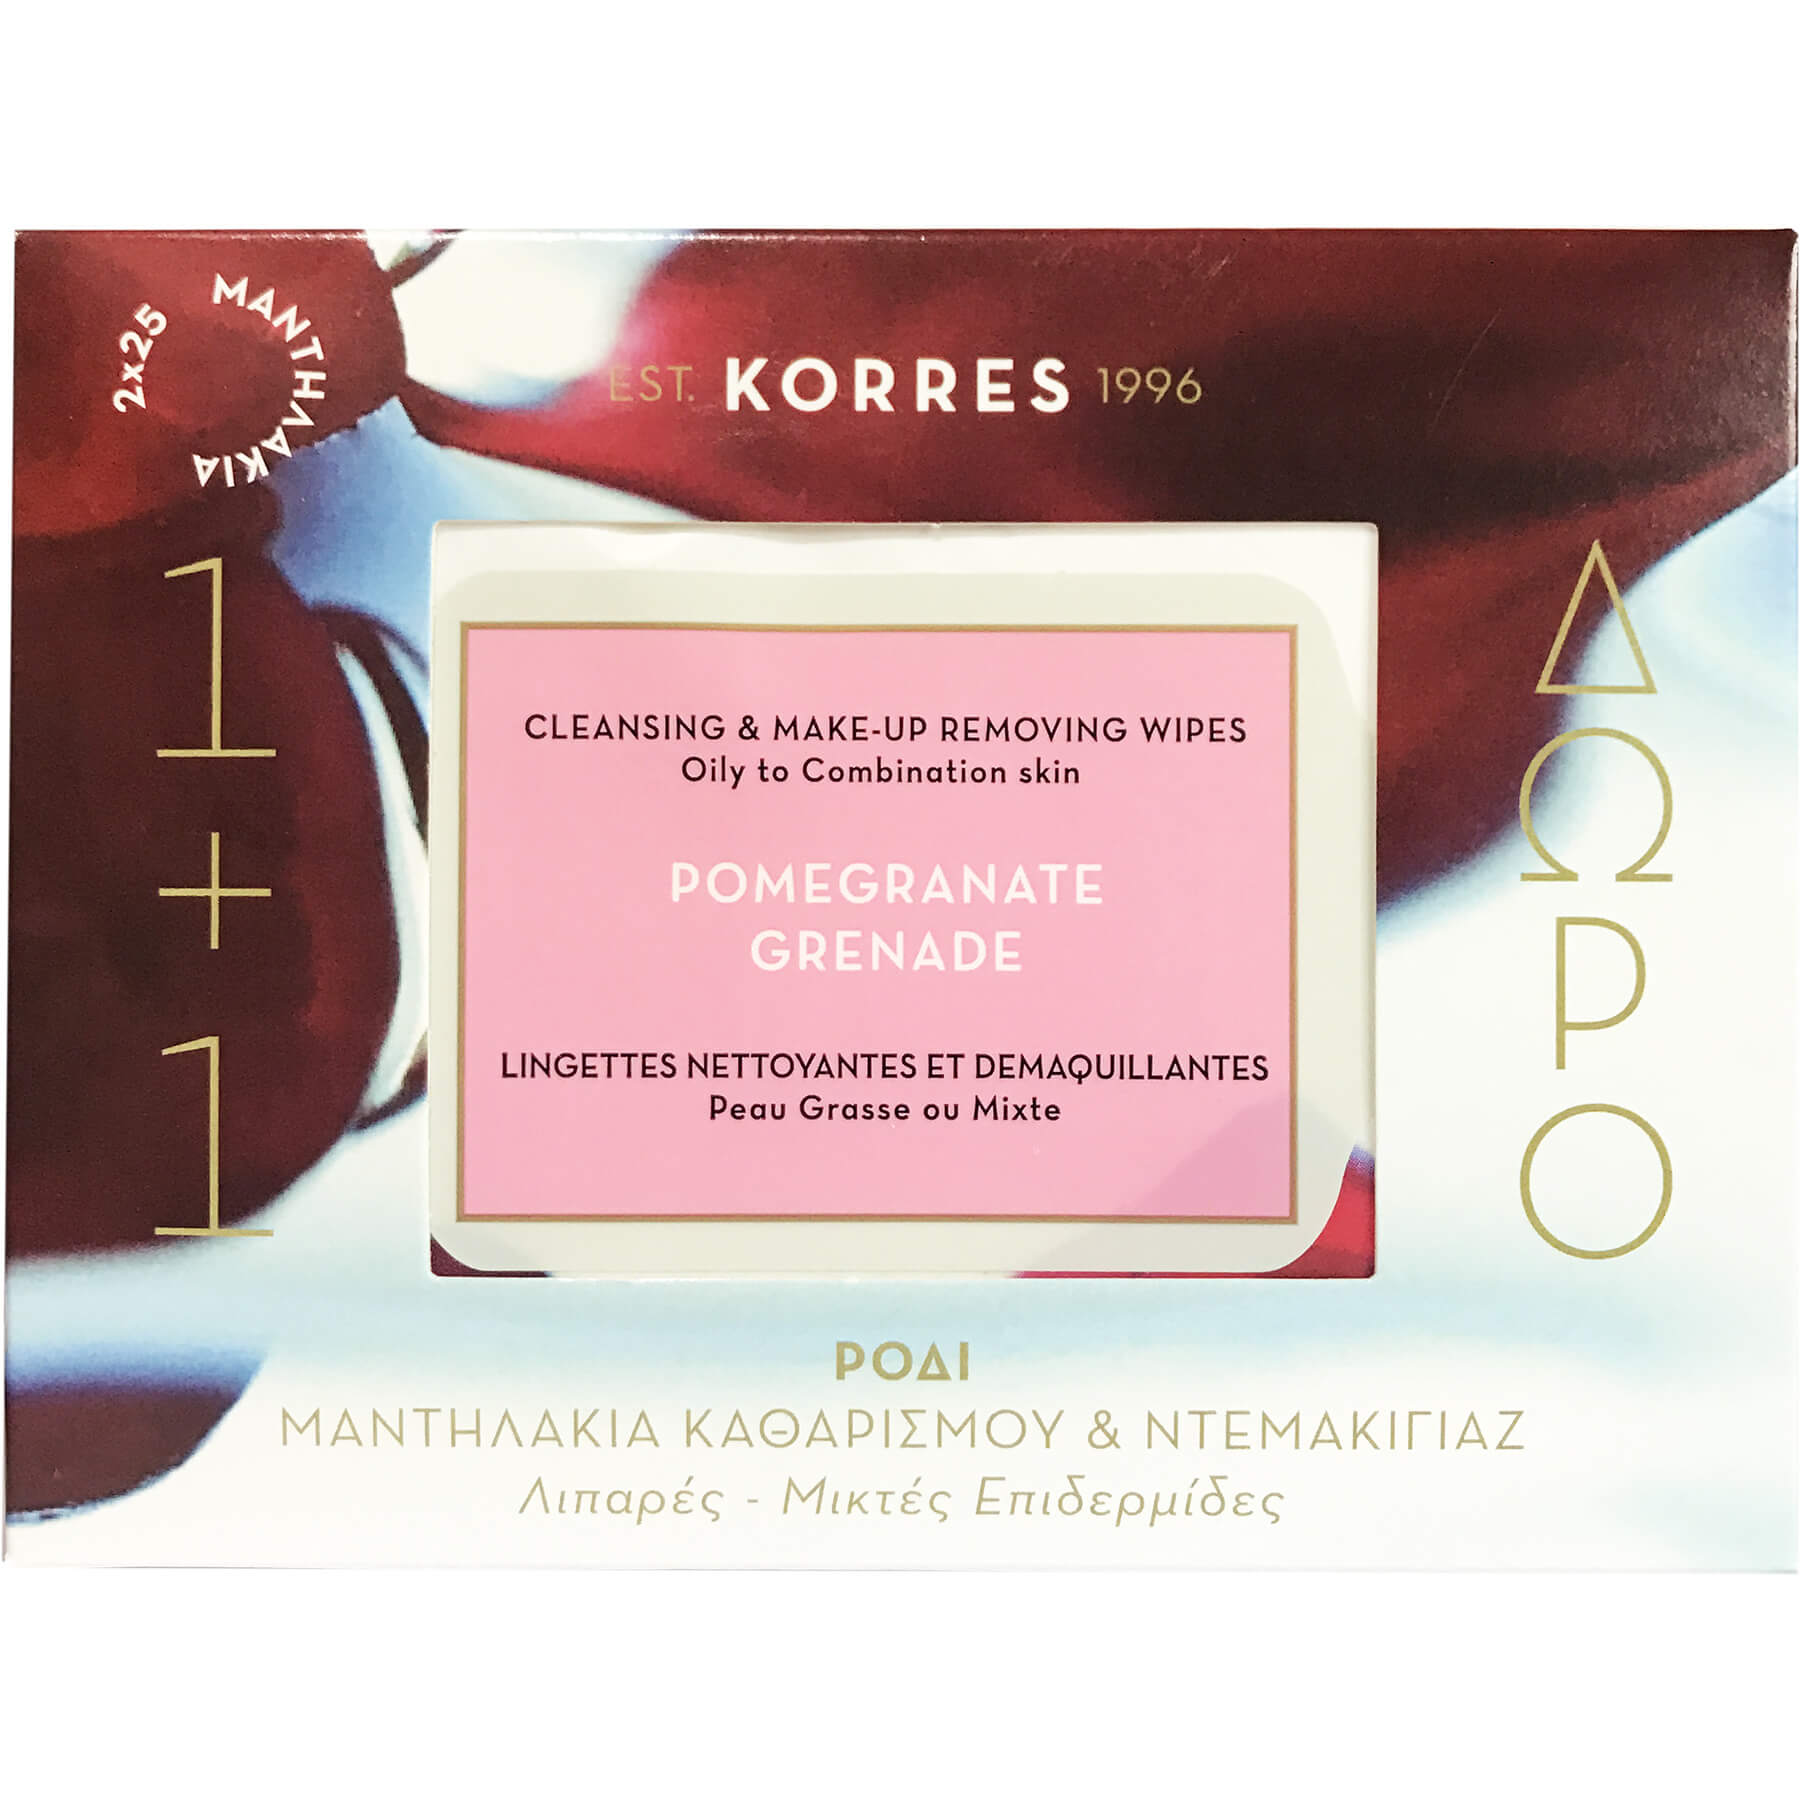 Korres Πακέτο Προσφοράς Ρόδι Μαντηλάκια Καθαρισμού & Ντεμακιγιάζ για Λιπαρές – Μικτές Επιδερμίδες 2×25 τεμάχια 1+1 Δώρο